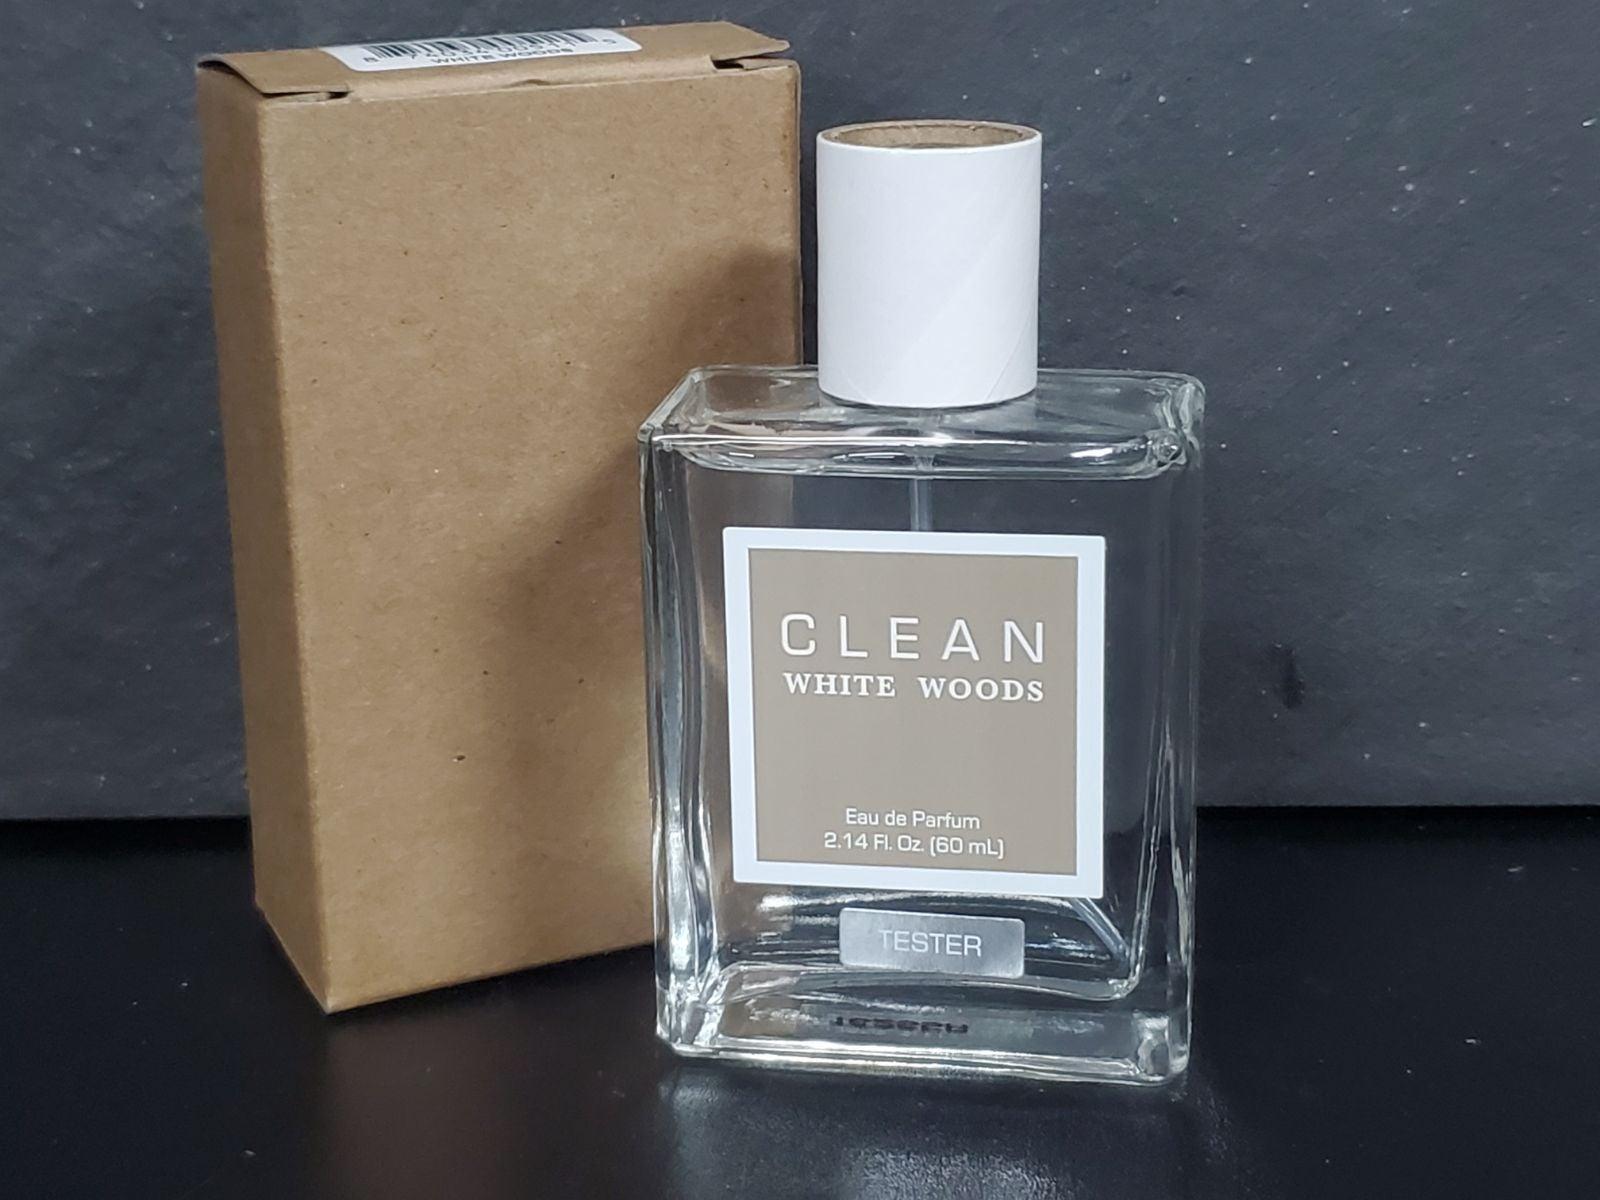 Clean WHITE WOODS 2.14 oz EDP spray TST